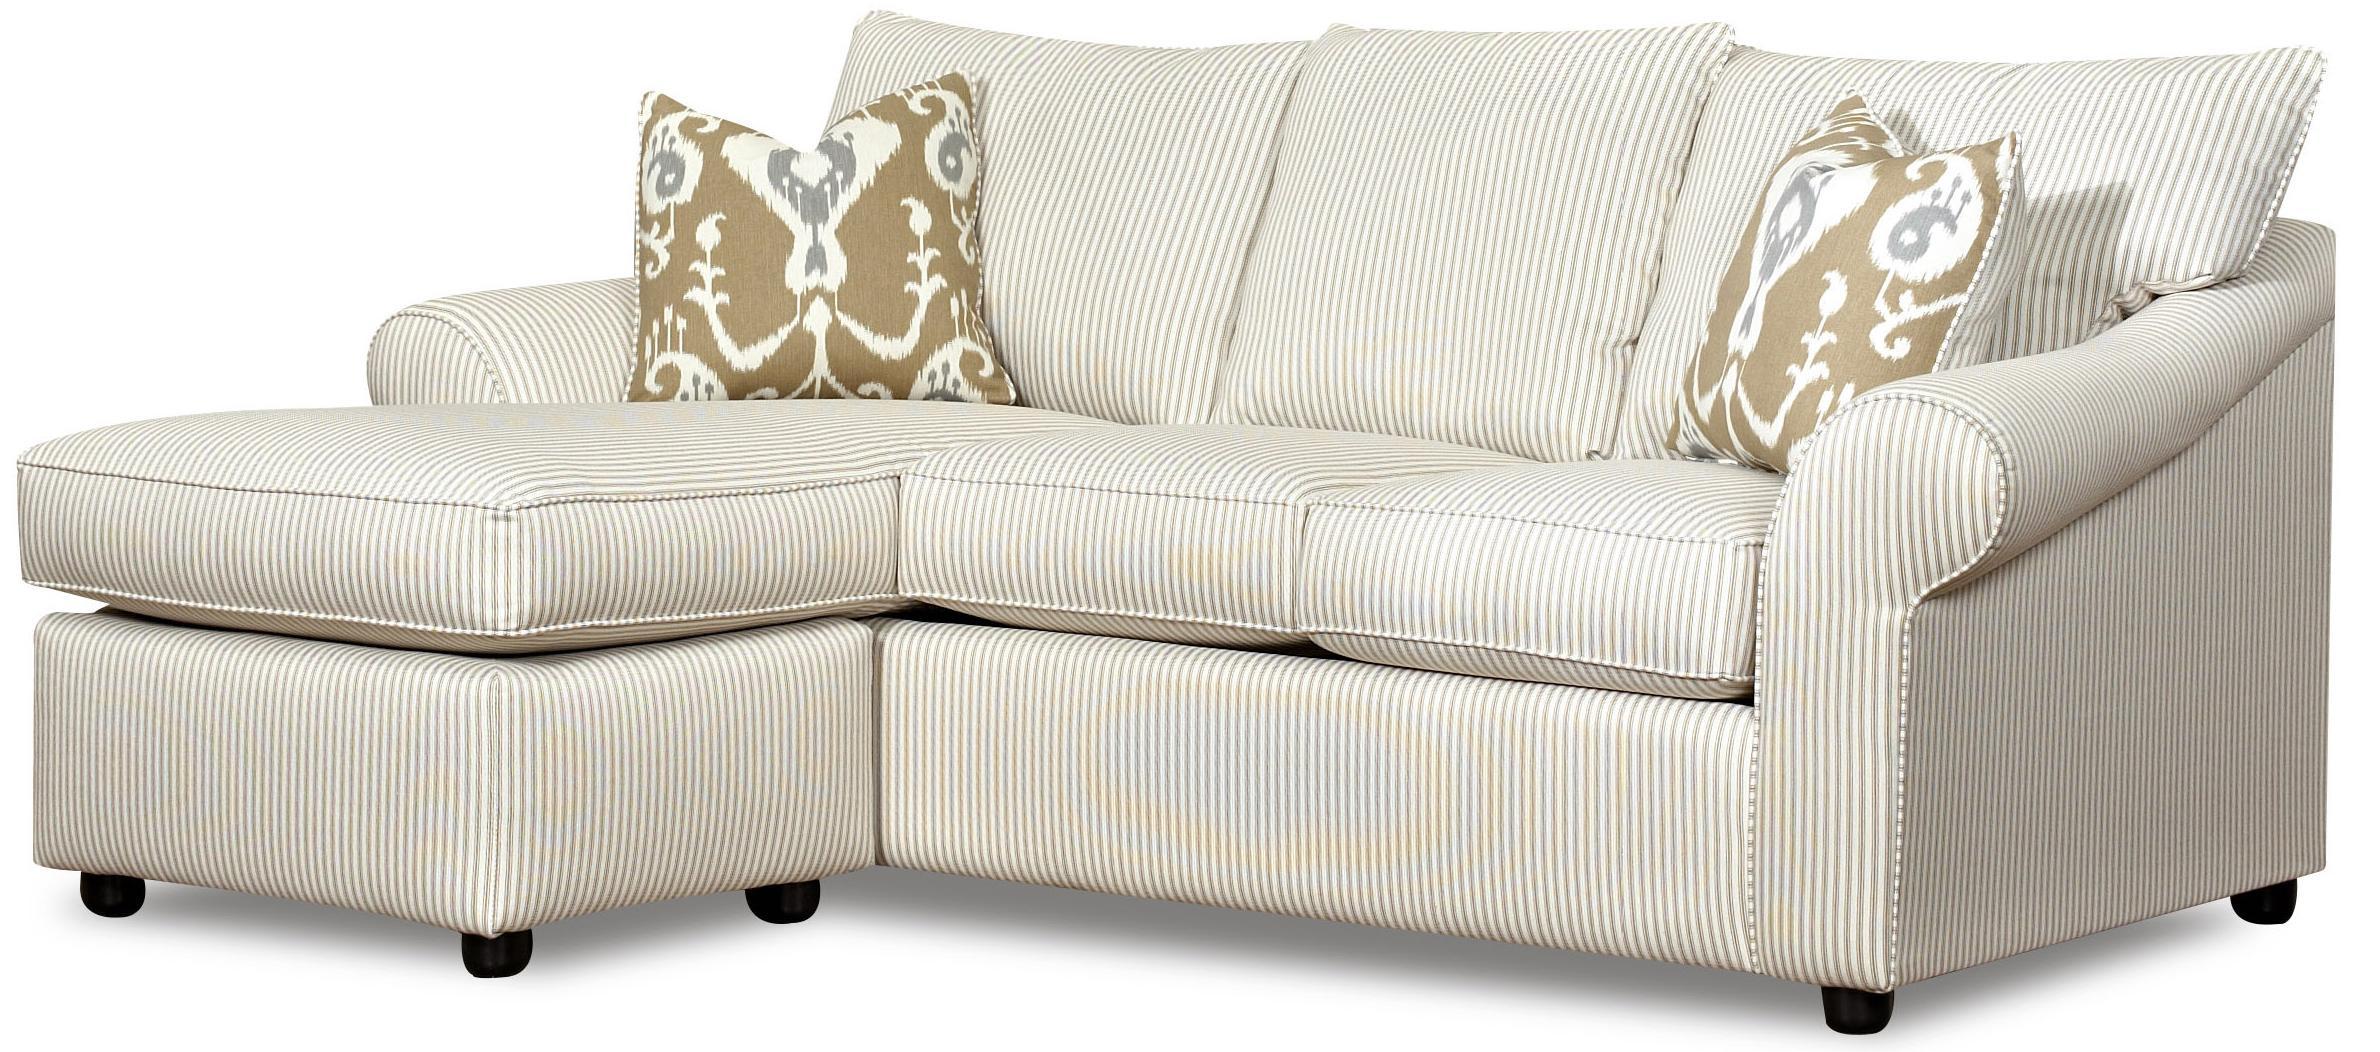 chaise lounge sofa sofa chaise QFKHVIX